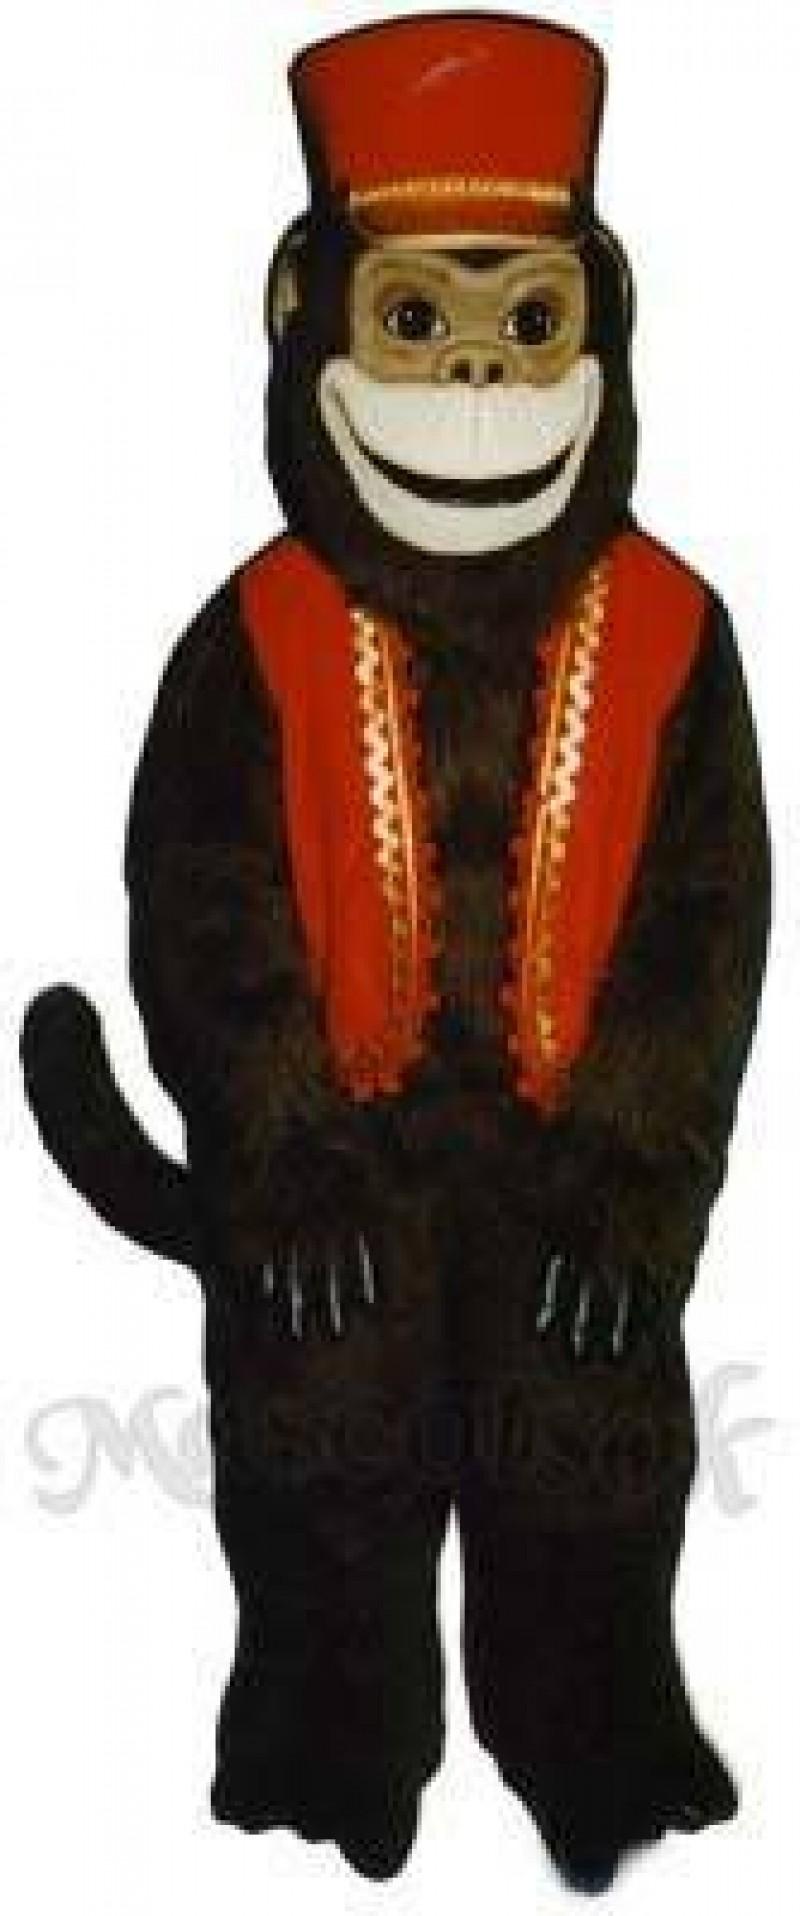 Organ Grinder Monkey with Vest & Hat Mascot Costume